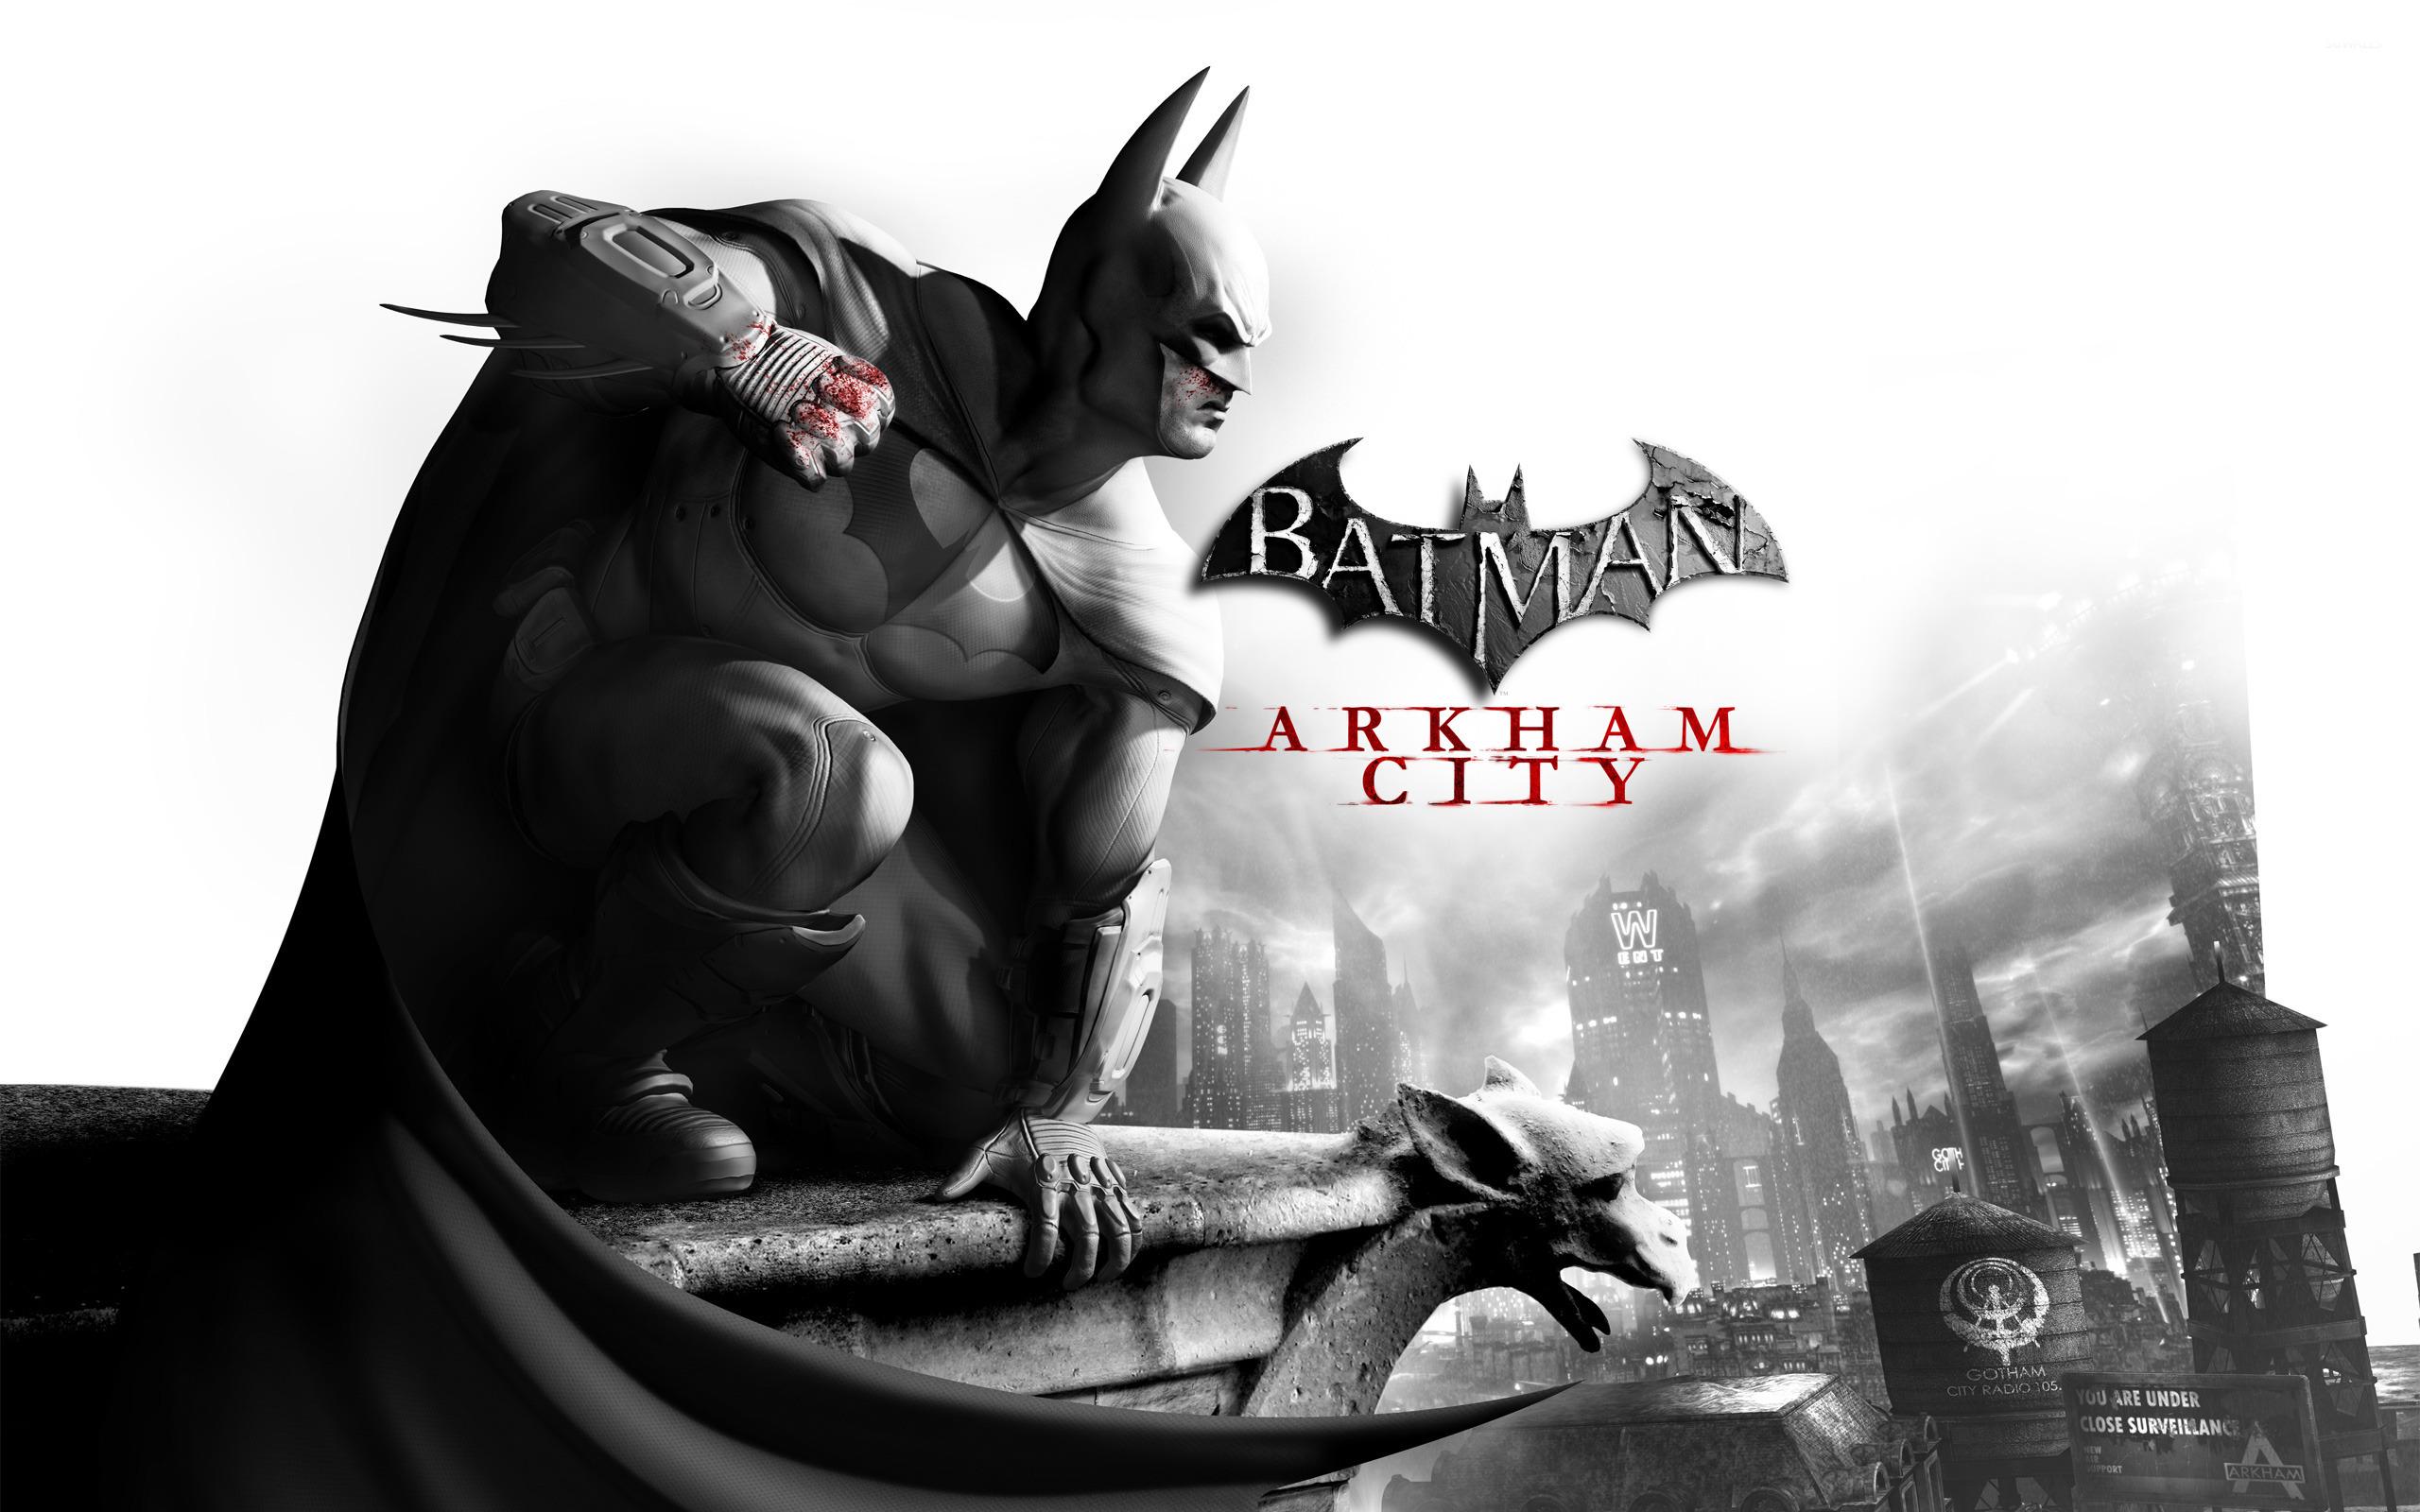 Batman Arkham City wallpaper   Game wallpapers   11422 2560x1600